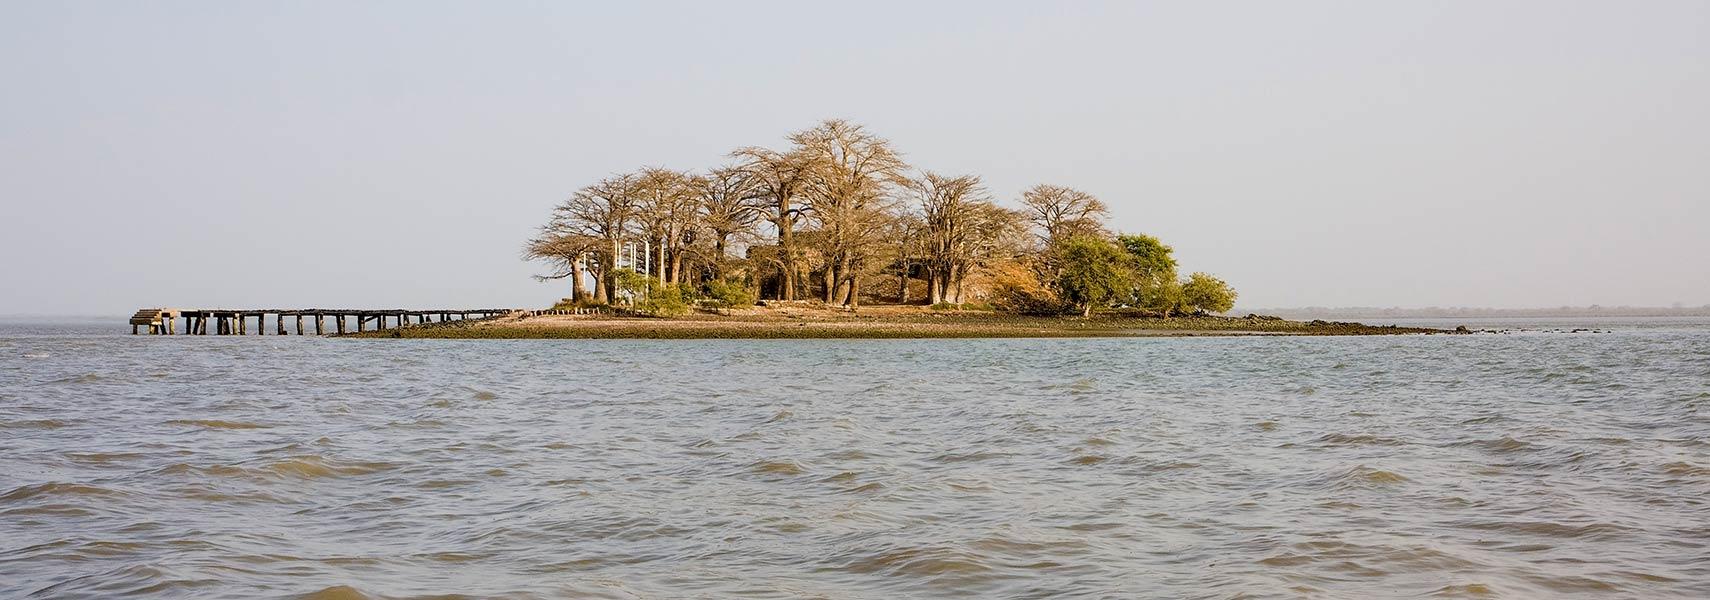 River Island Business